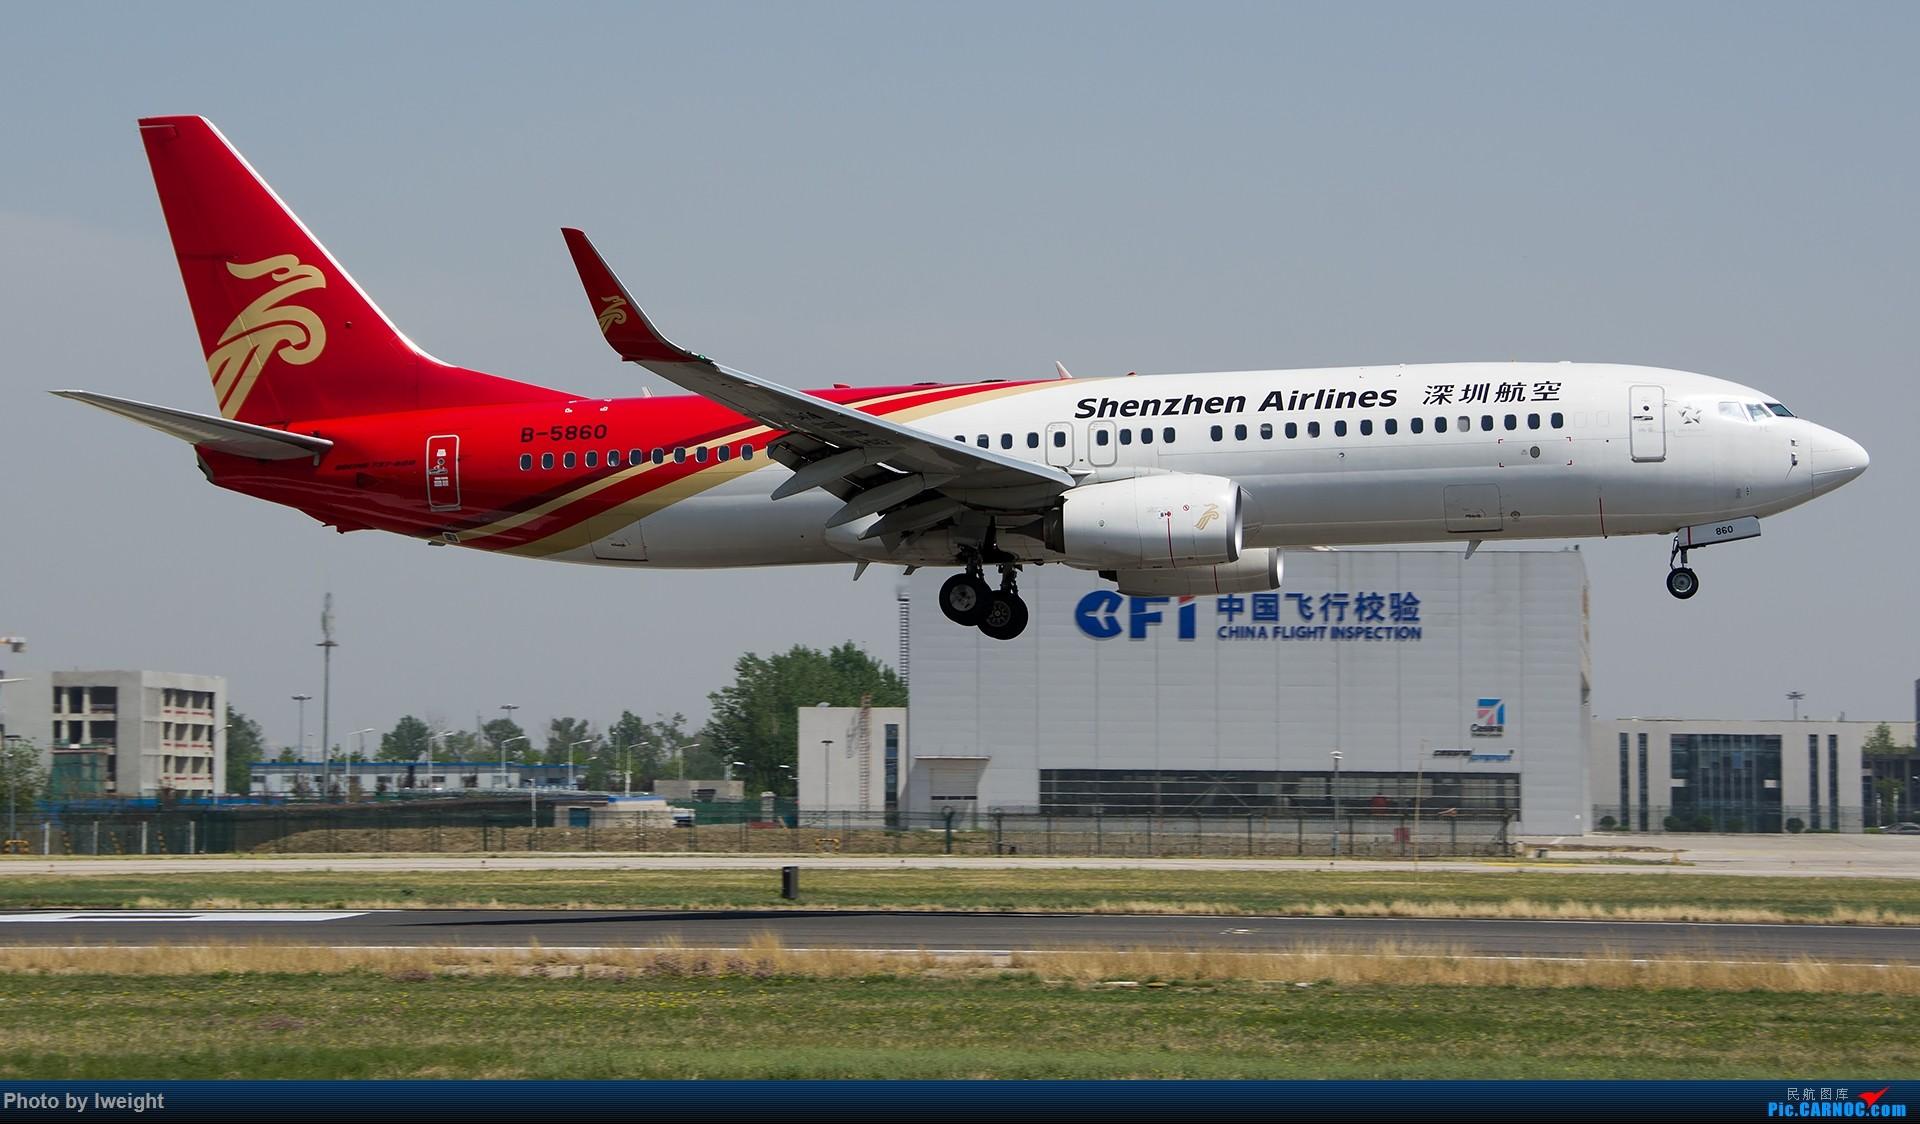 Re:[原创]2015年第一次在PEK拍北向南,其实是为Jimmy去的【2015-4-24】 BOEING 737-800 B-5860 中国北京首都国际机场